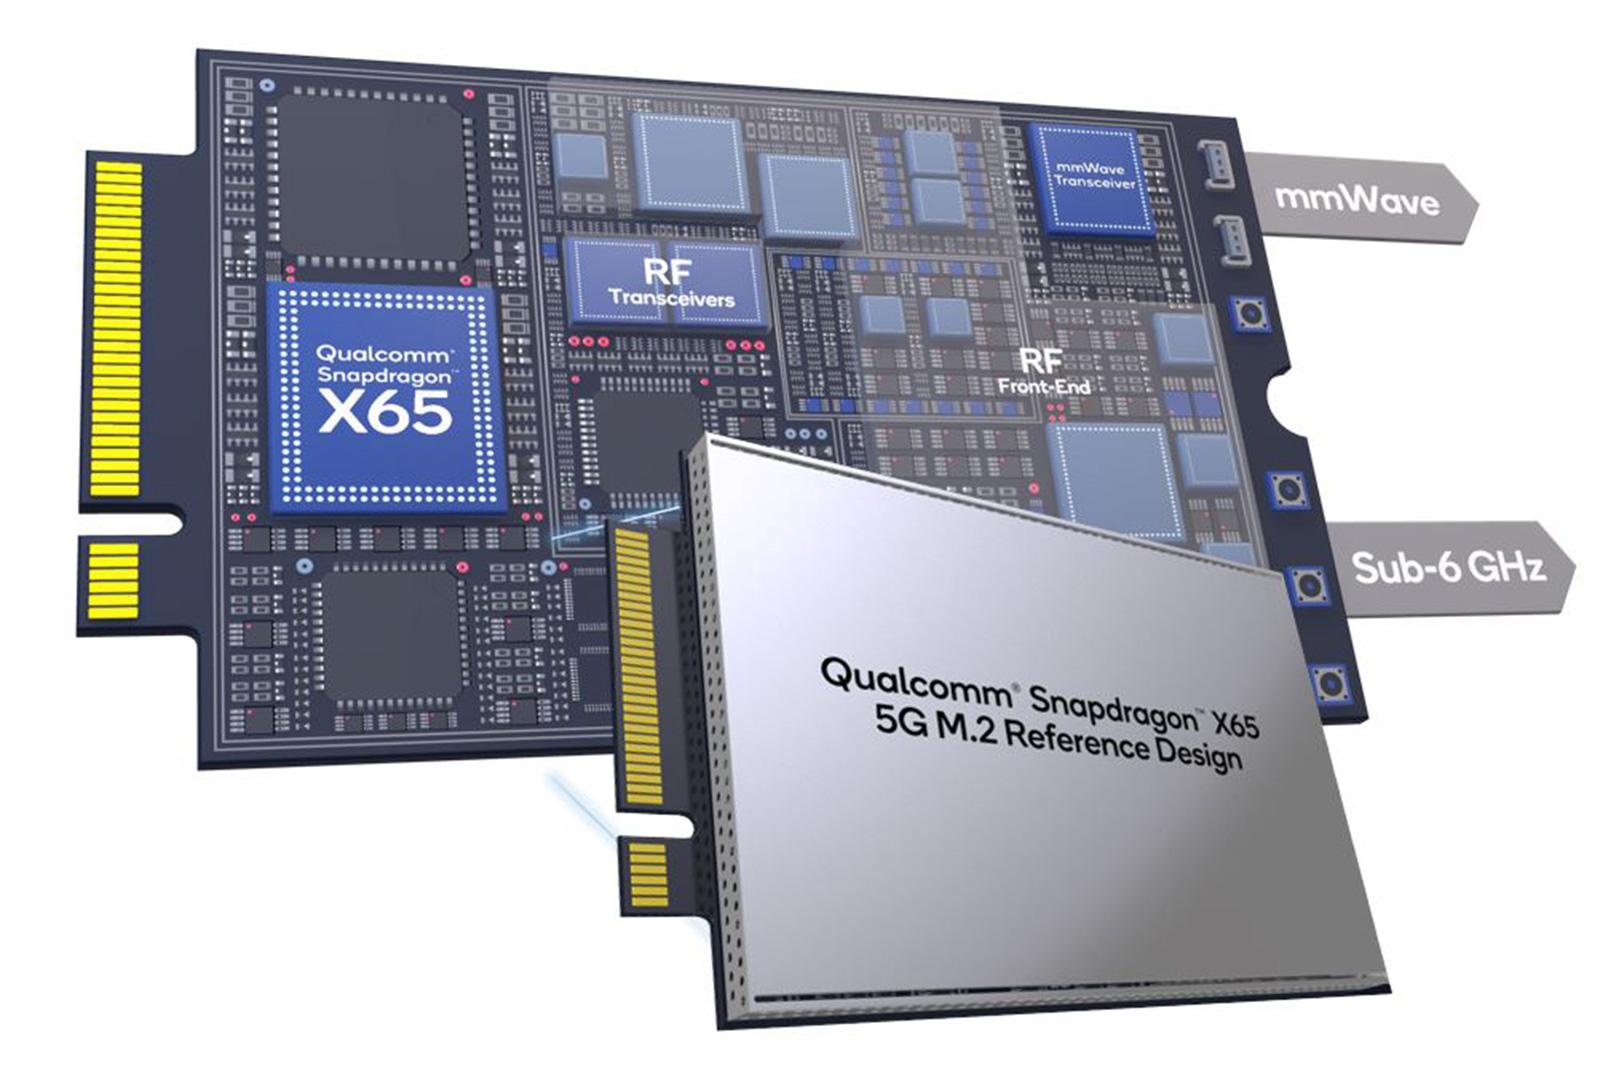 Snapdragon X65 5G M.2